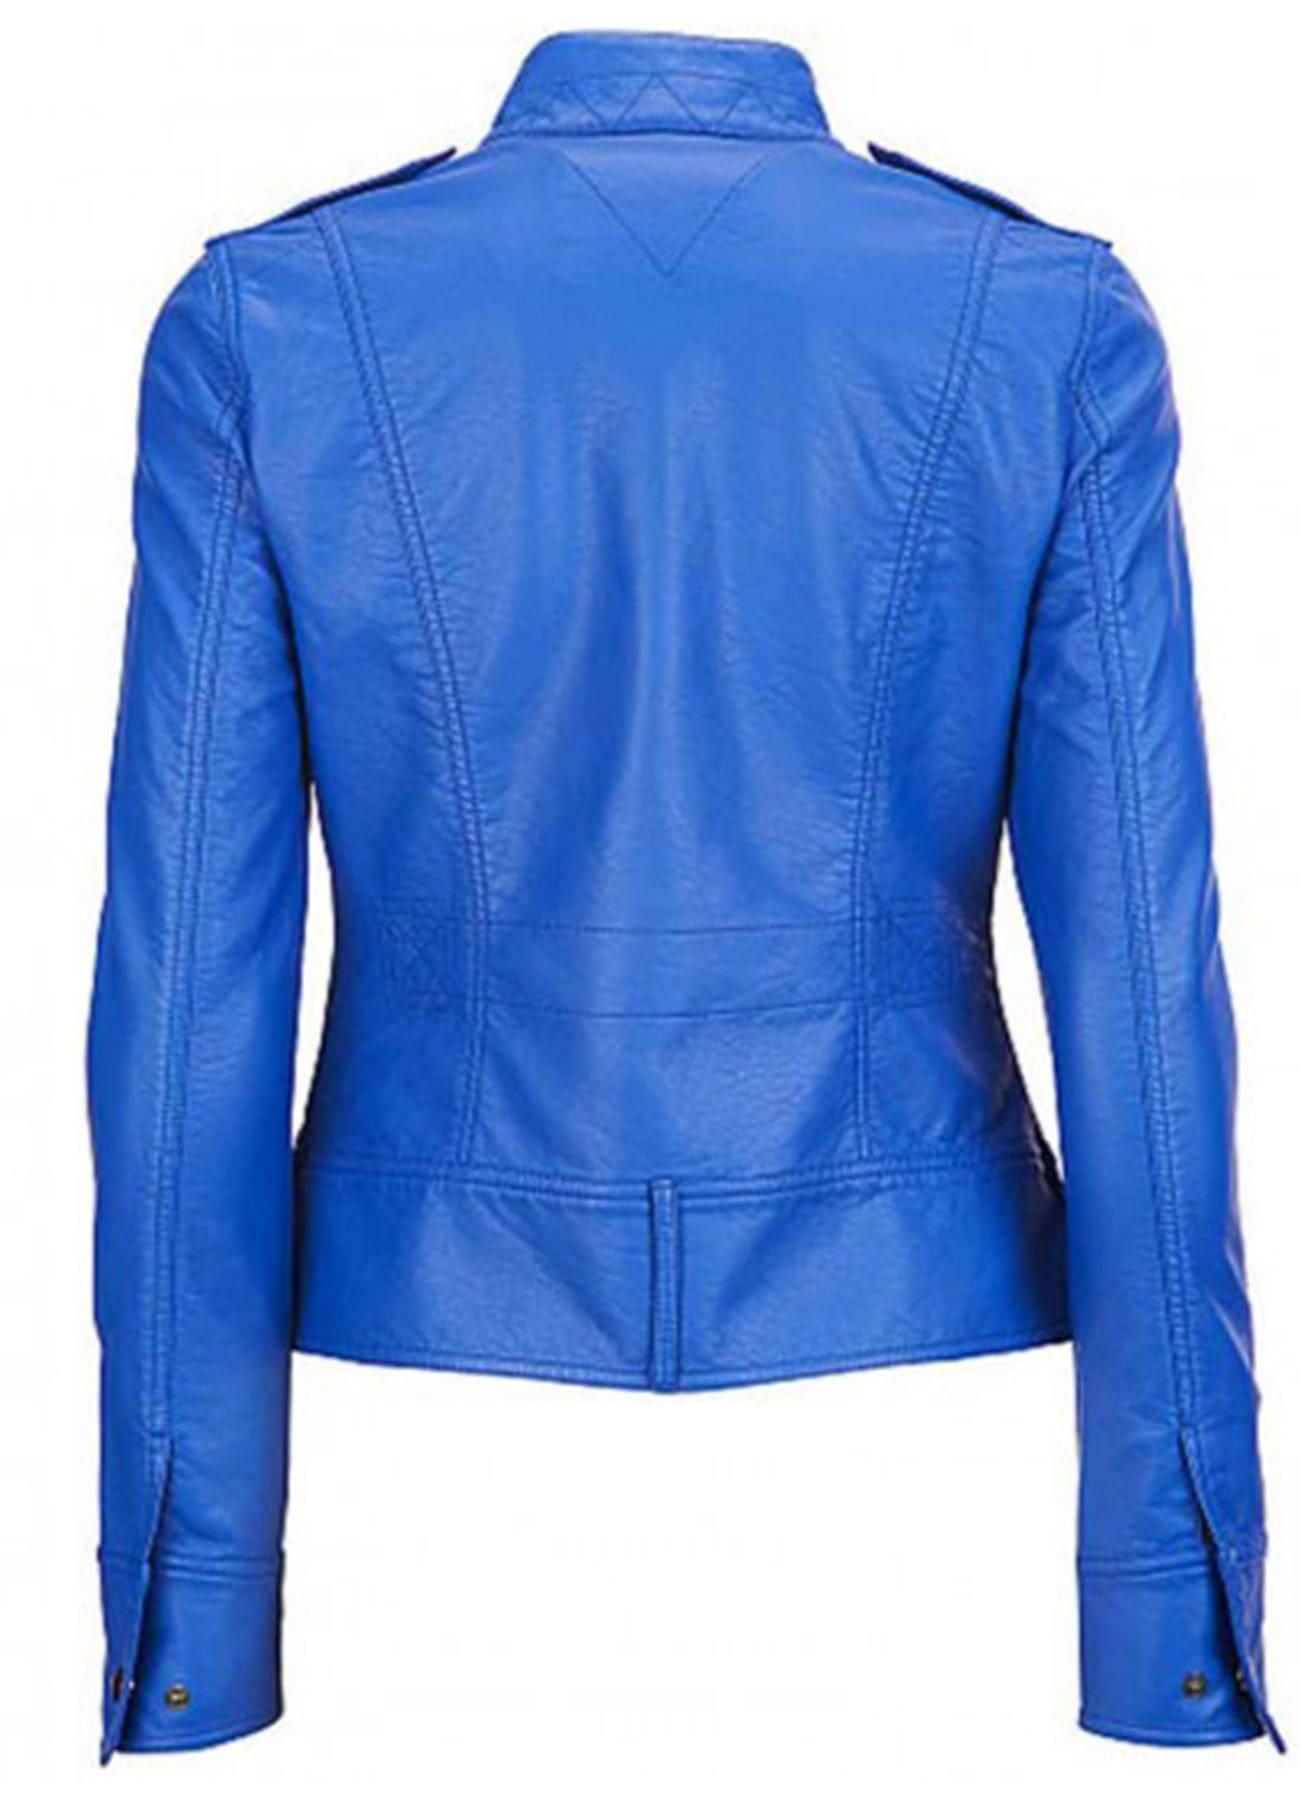 Women's Motorcycle Elegant Blue Genuine Leather Jacket